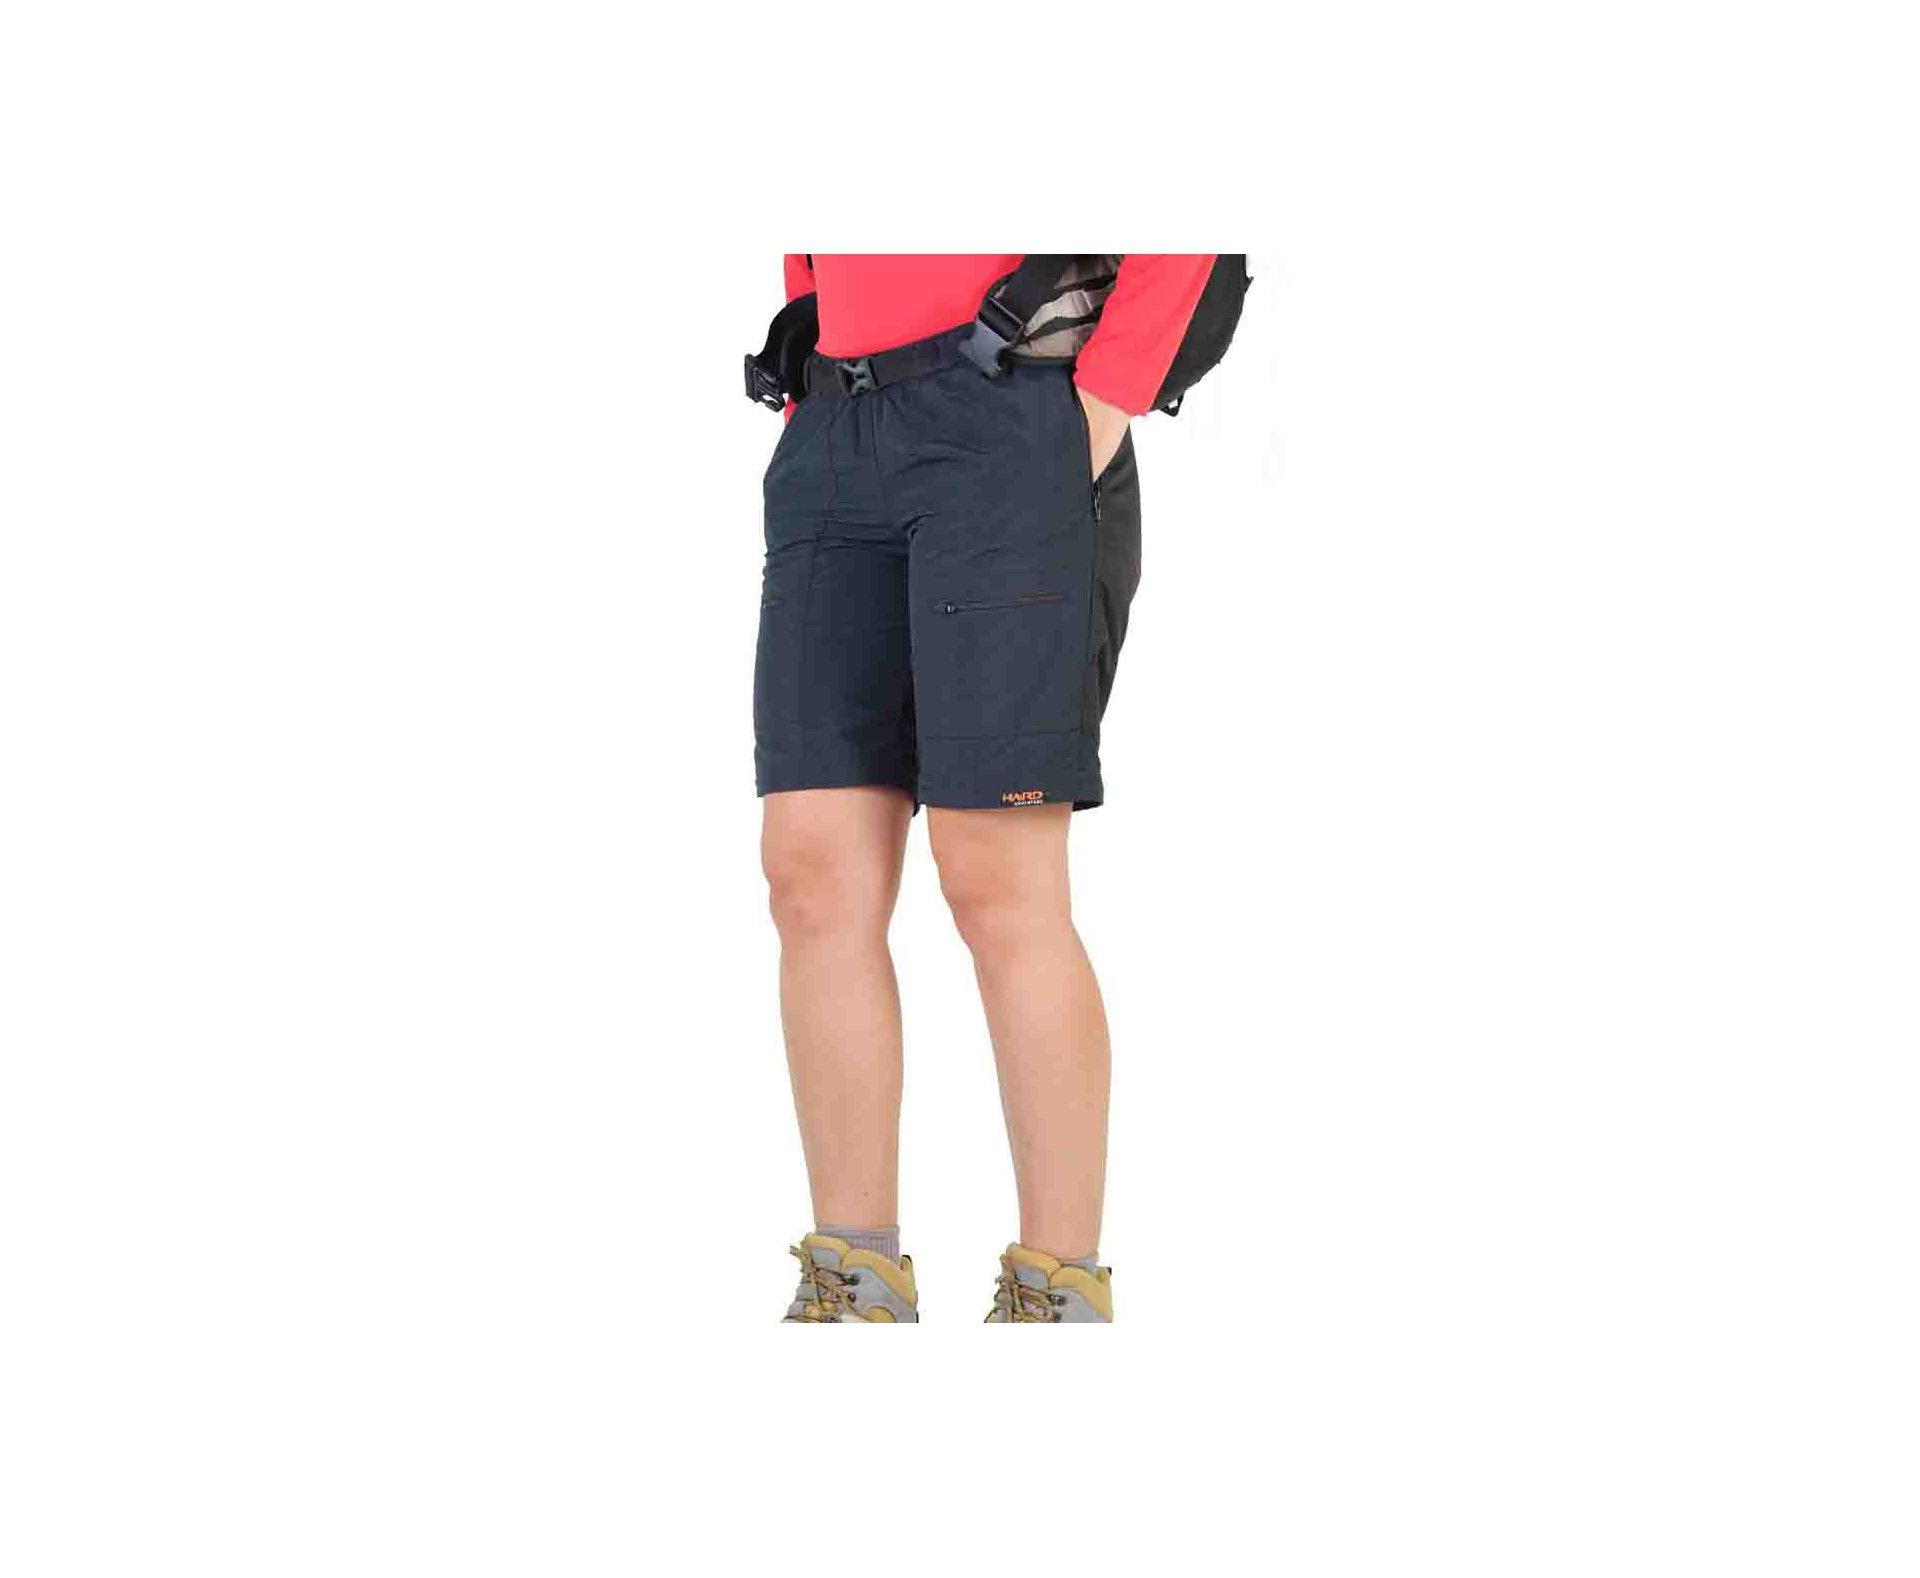 Calça-bermuda Pro Mountain Feminina Preto - Hard - PP